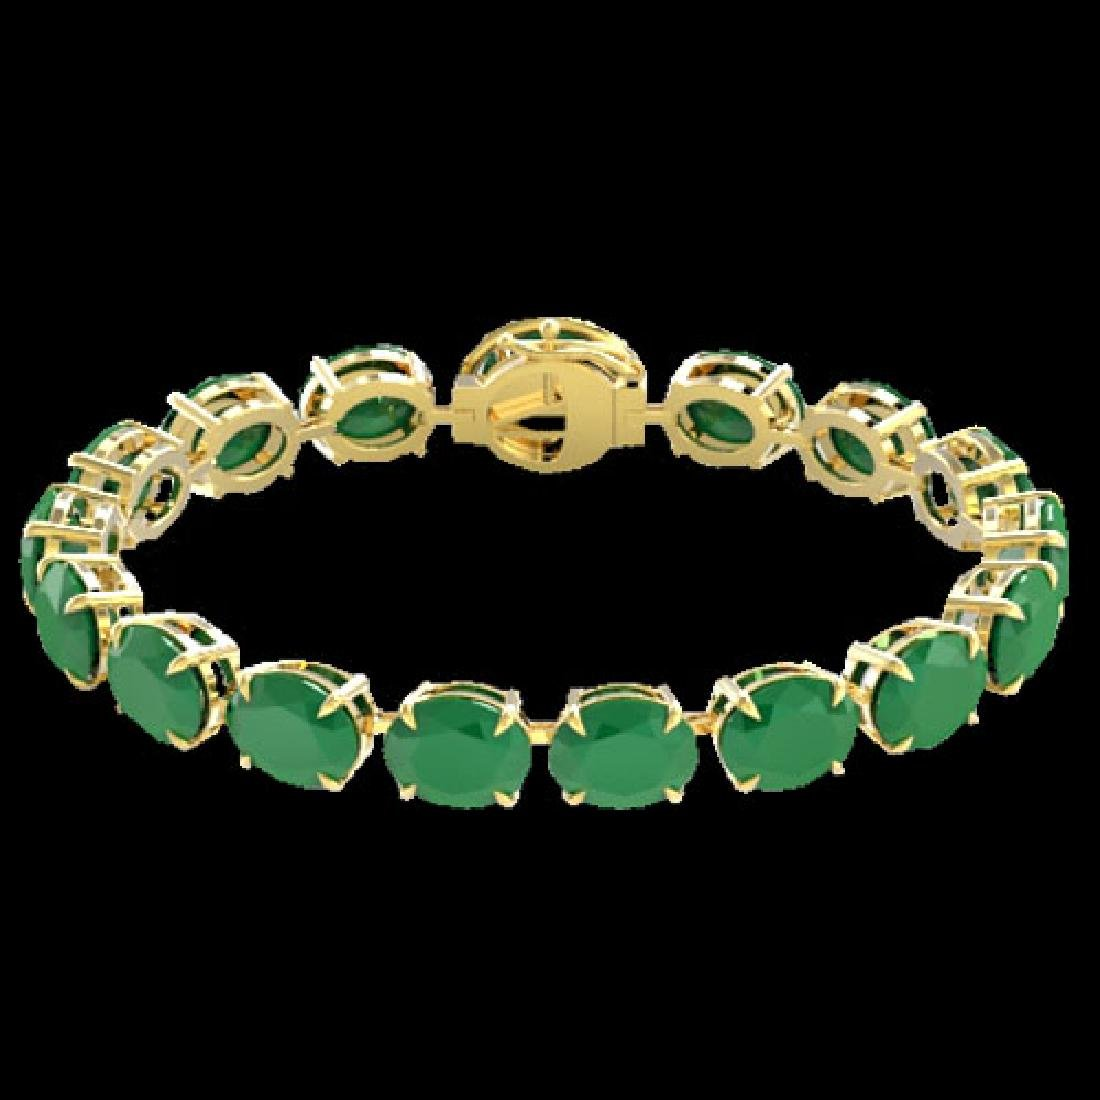 76 CTW Emerald & Micro Pave VS/SI Diamond Halo Bracelet - 2